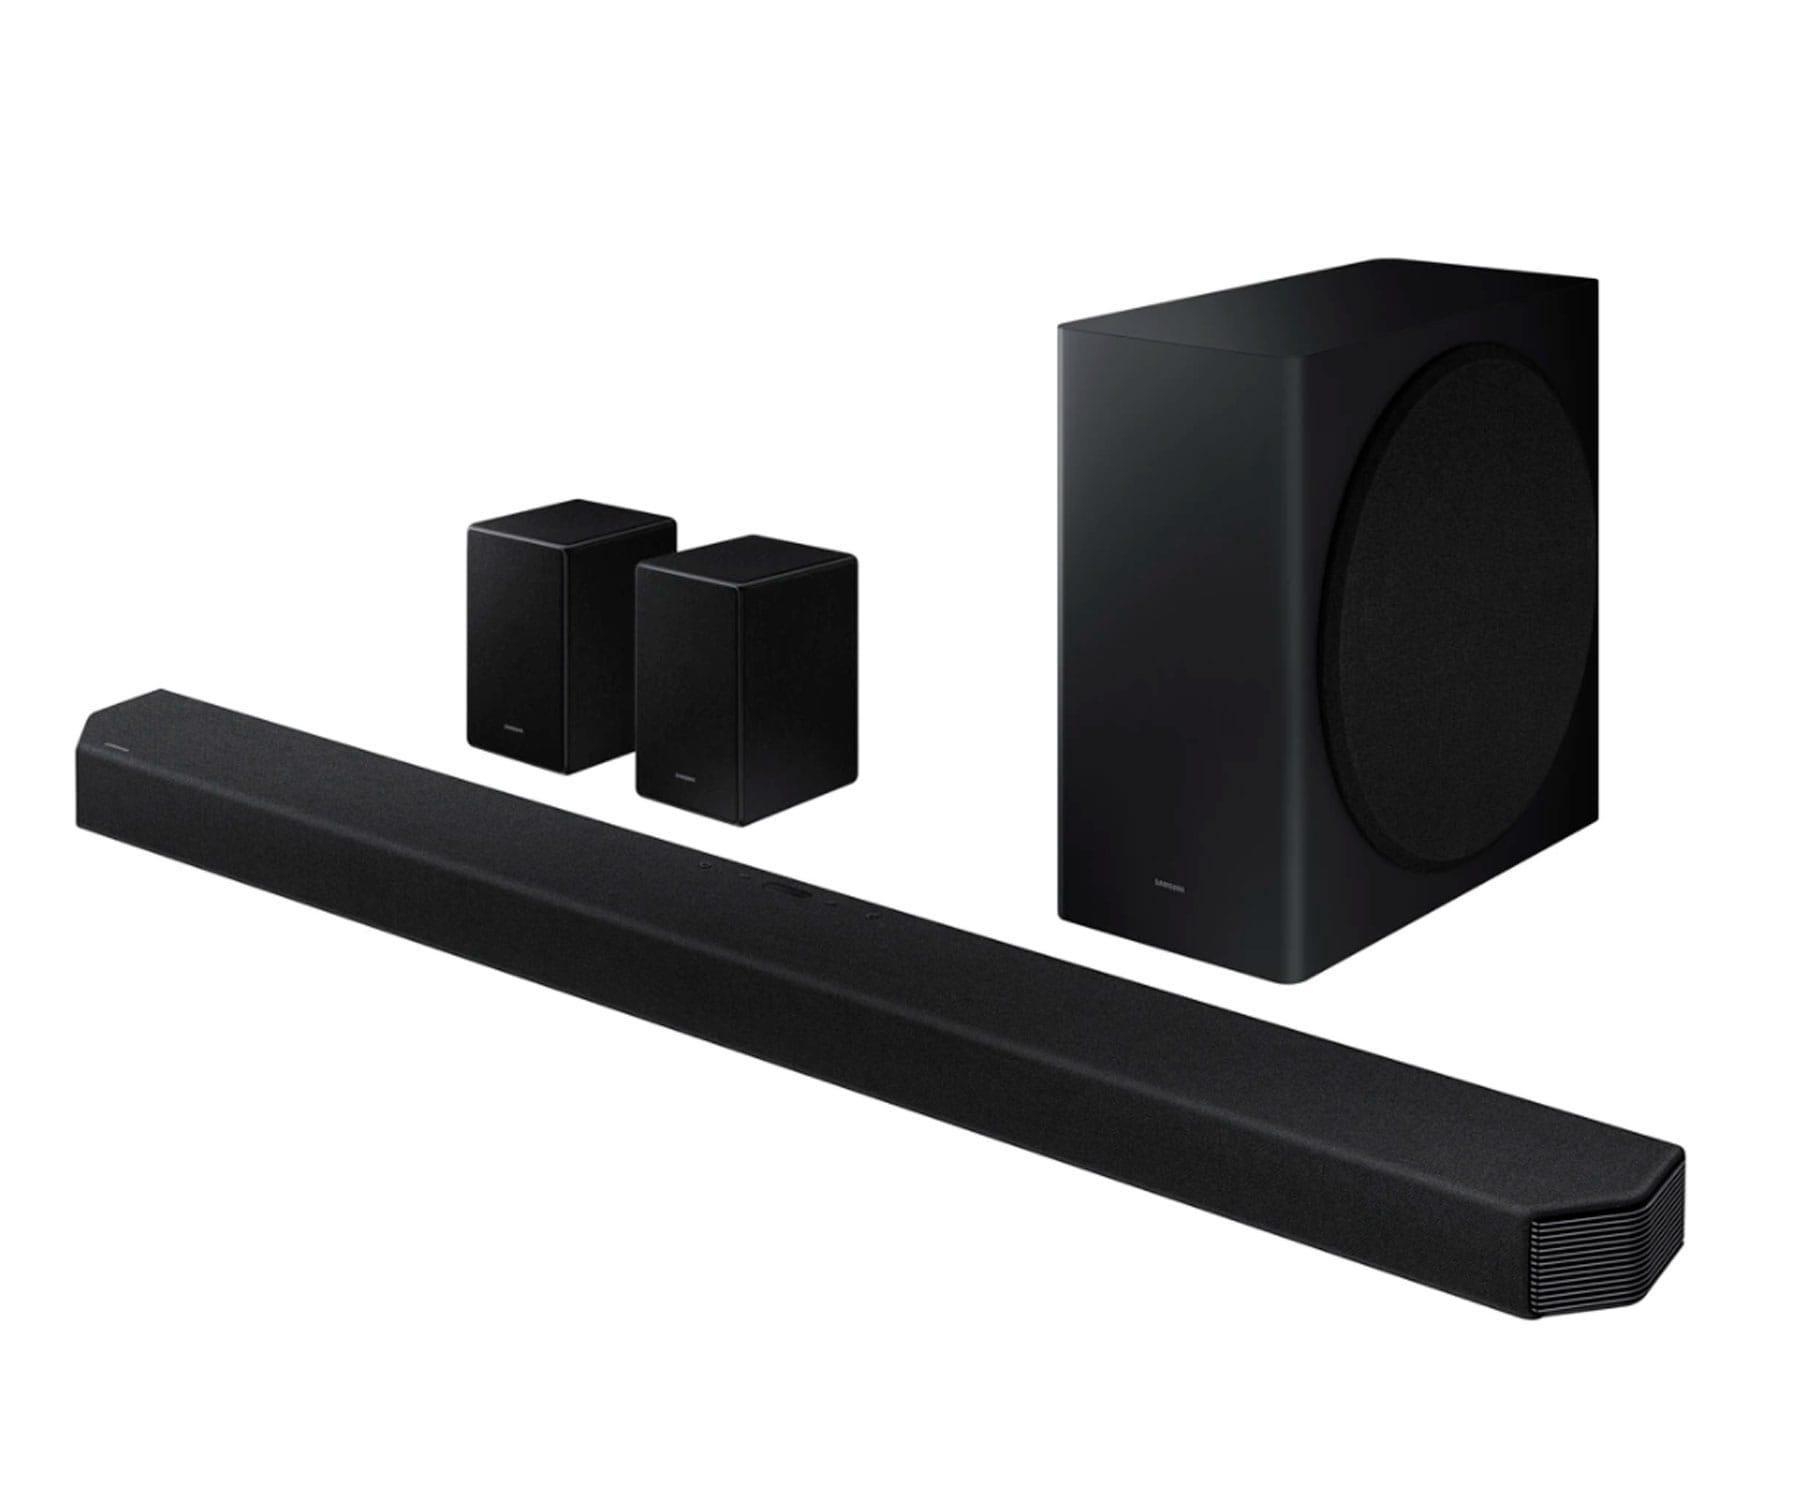 Samsung HW-Q950A/ZF Barra de sonido 11.1.4 canales/616W/Subwoofer/Q-Symphony/Dolby Atmos DTS:X/Altavoces traseros